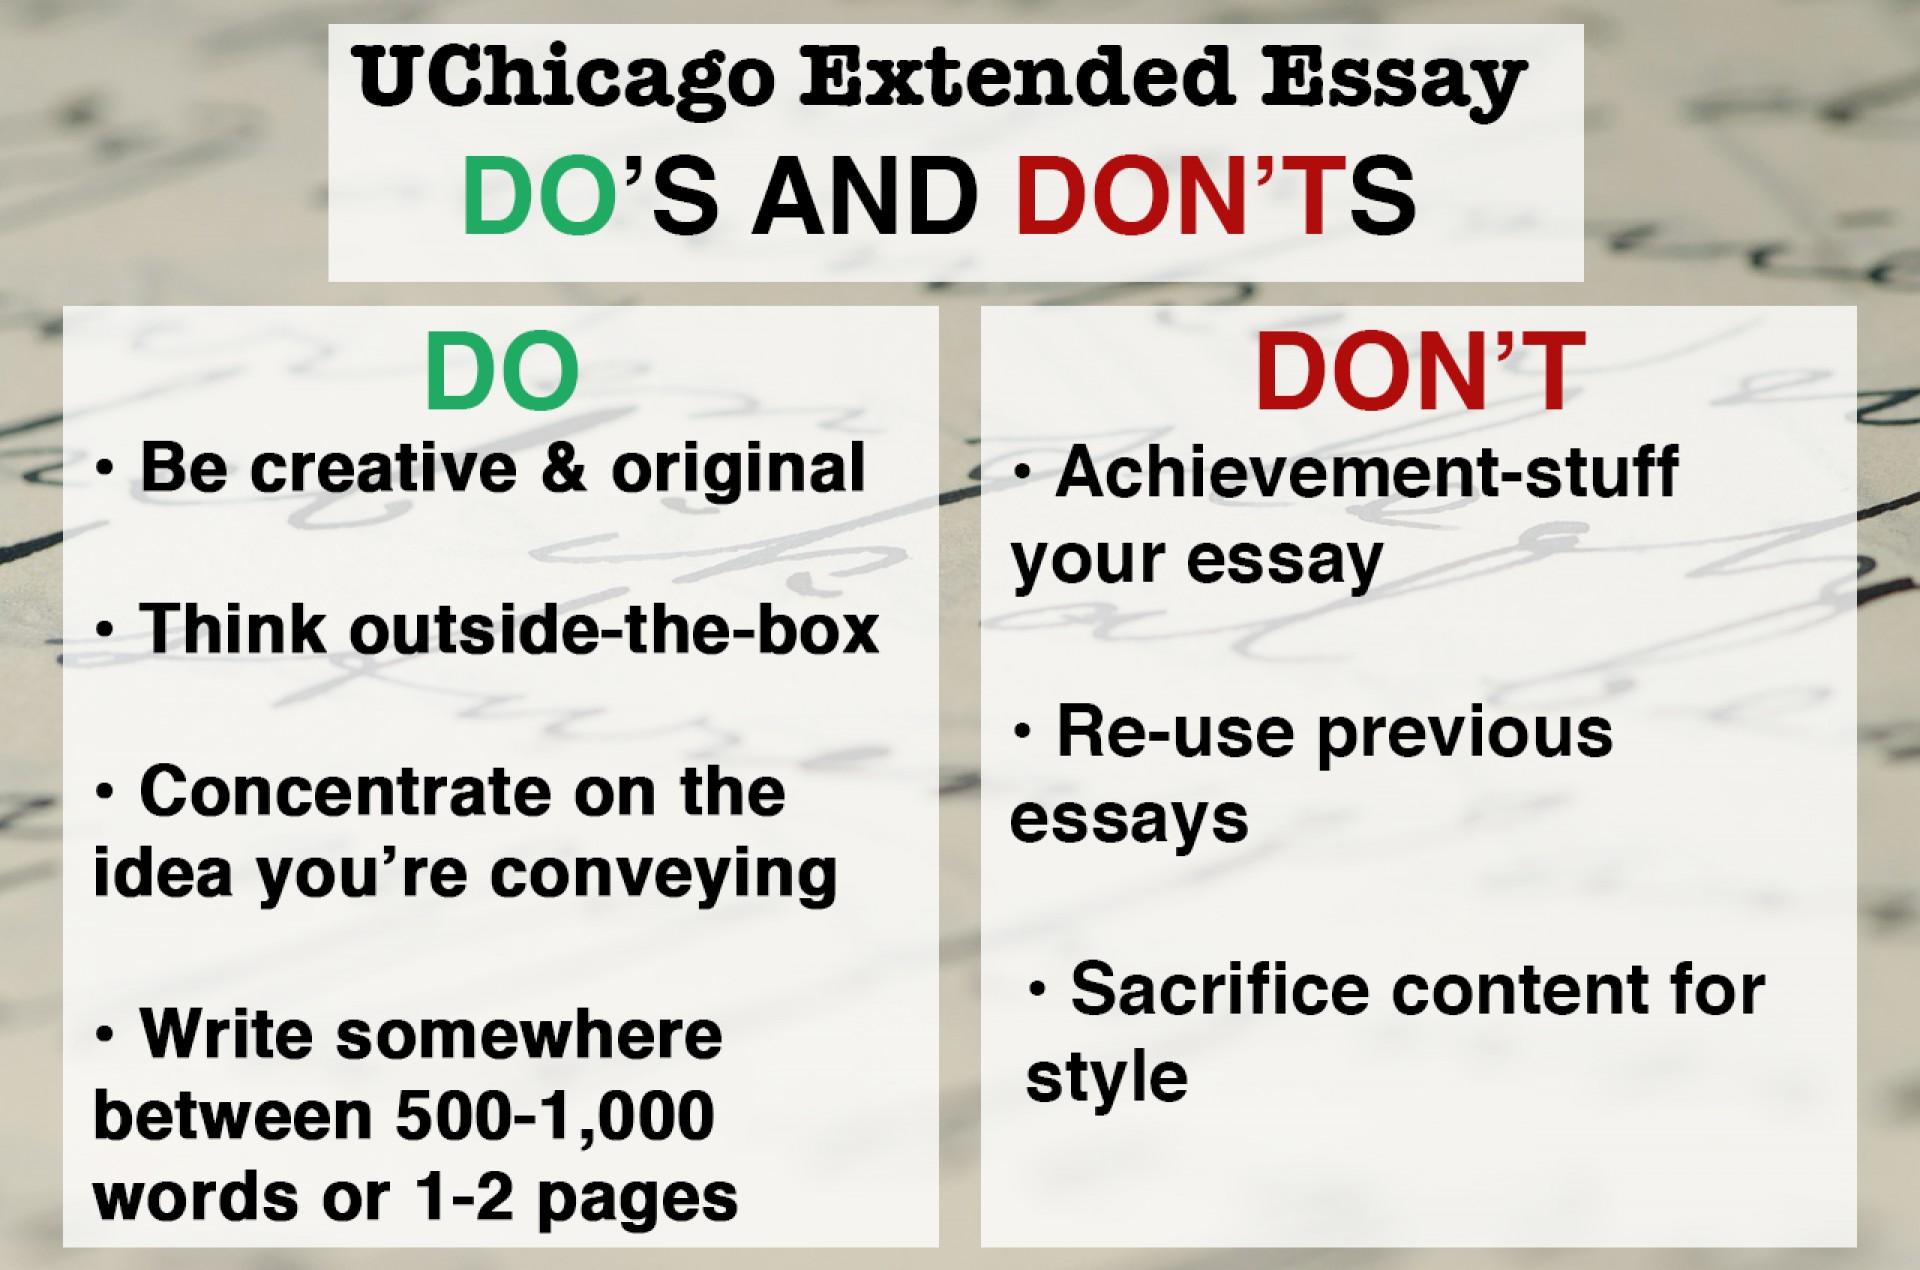 002 Uchicago Essays Essay Astounding Law That Worked Length Reddit 1920